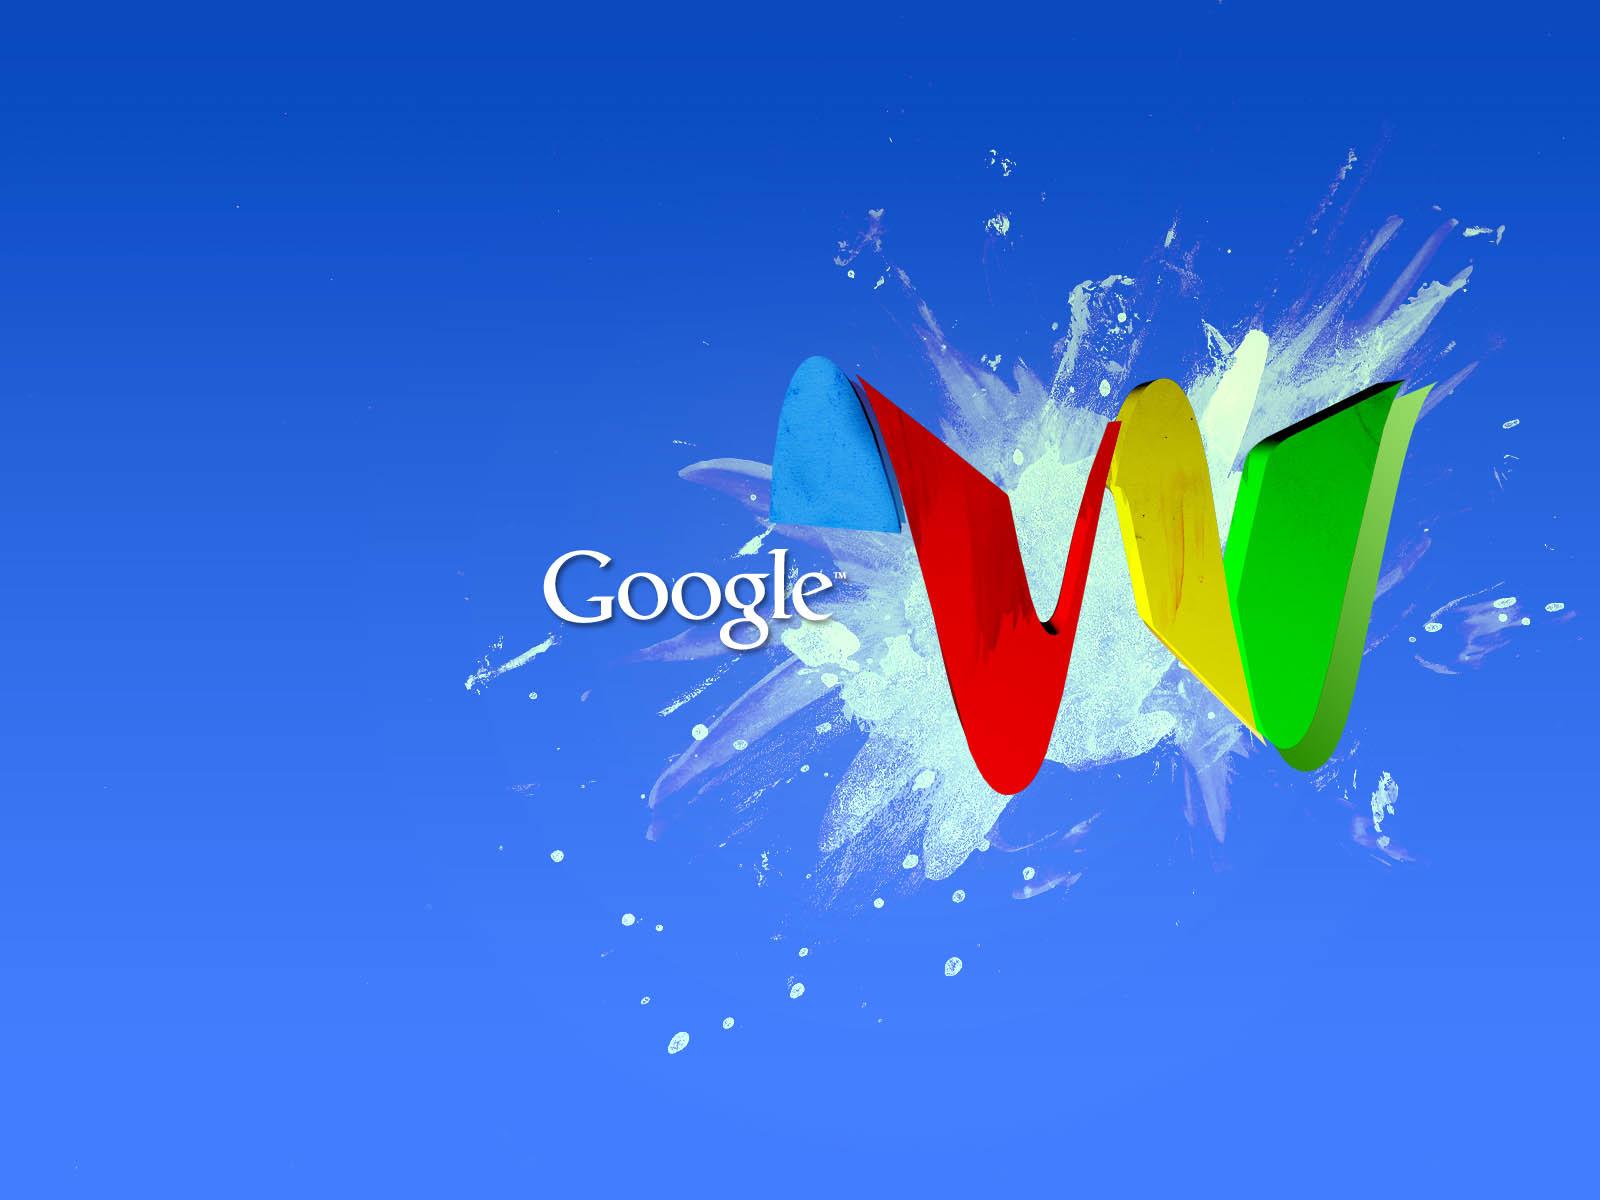 Google Desktop Backgrounds And Wallpapers